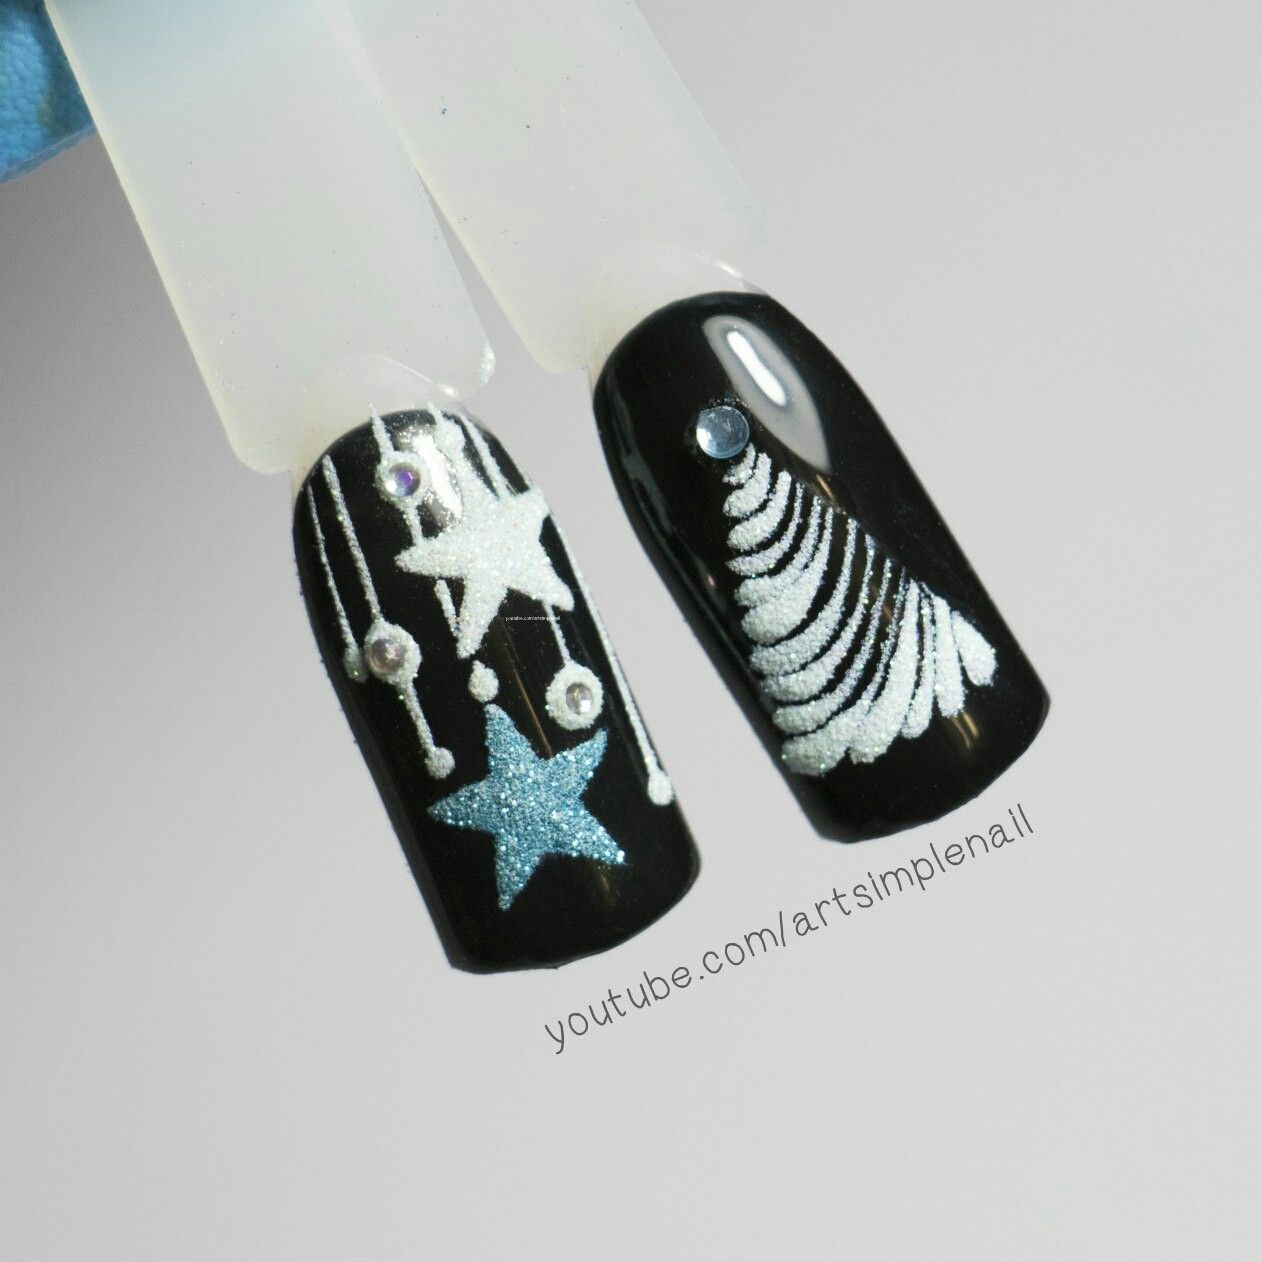 Pin by Анастасия Лиханова on Дизайн ногтей | Pinterest | Xmas nails ...